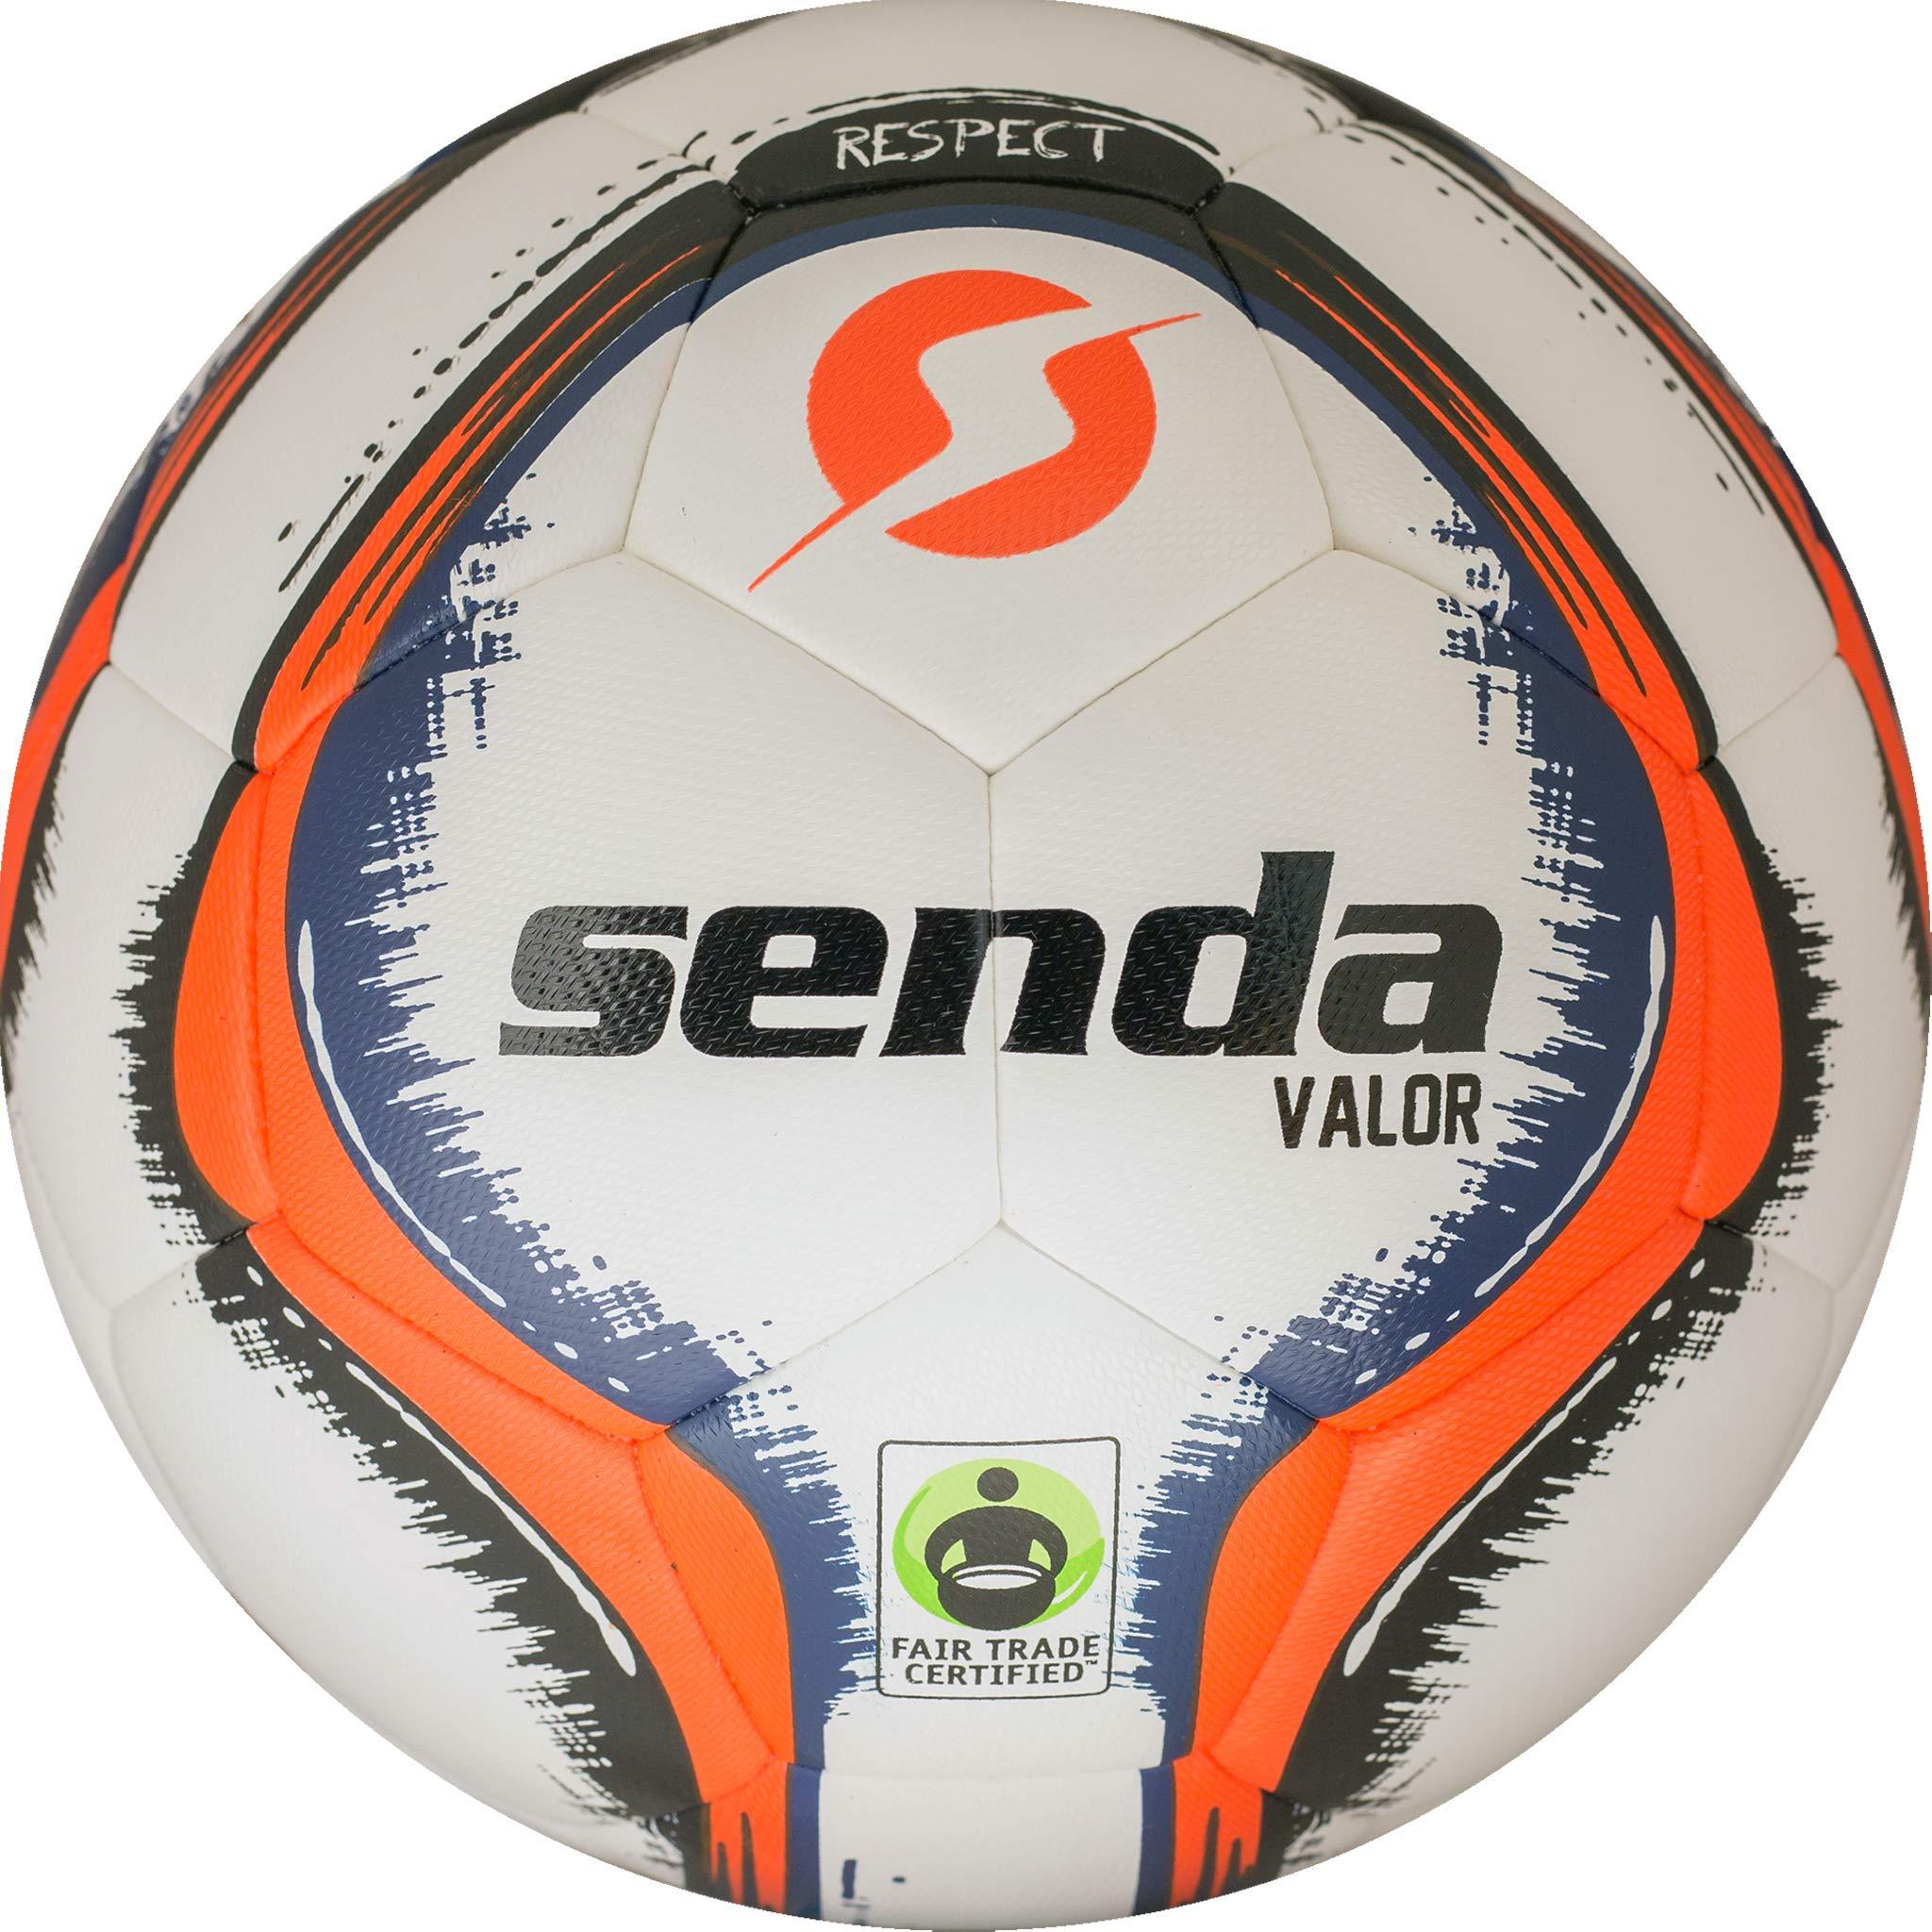 Senda Valor Match Soccer Ball, Fair Trade Certified, Orange/Navy Blue, Size 5 (Ages 13 & Up) by S Senda (Image #1)